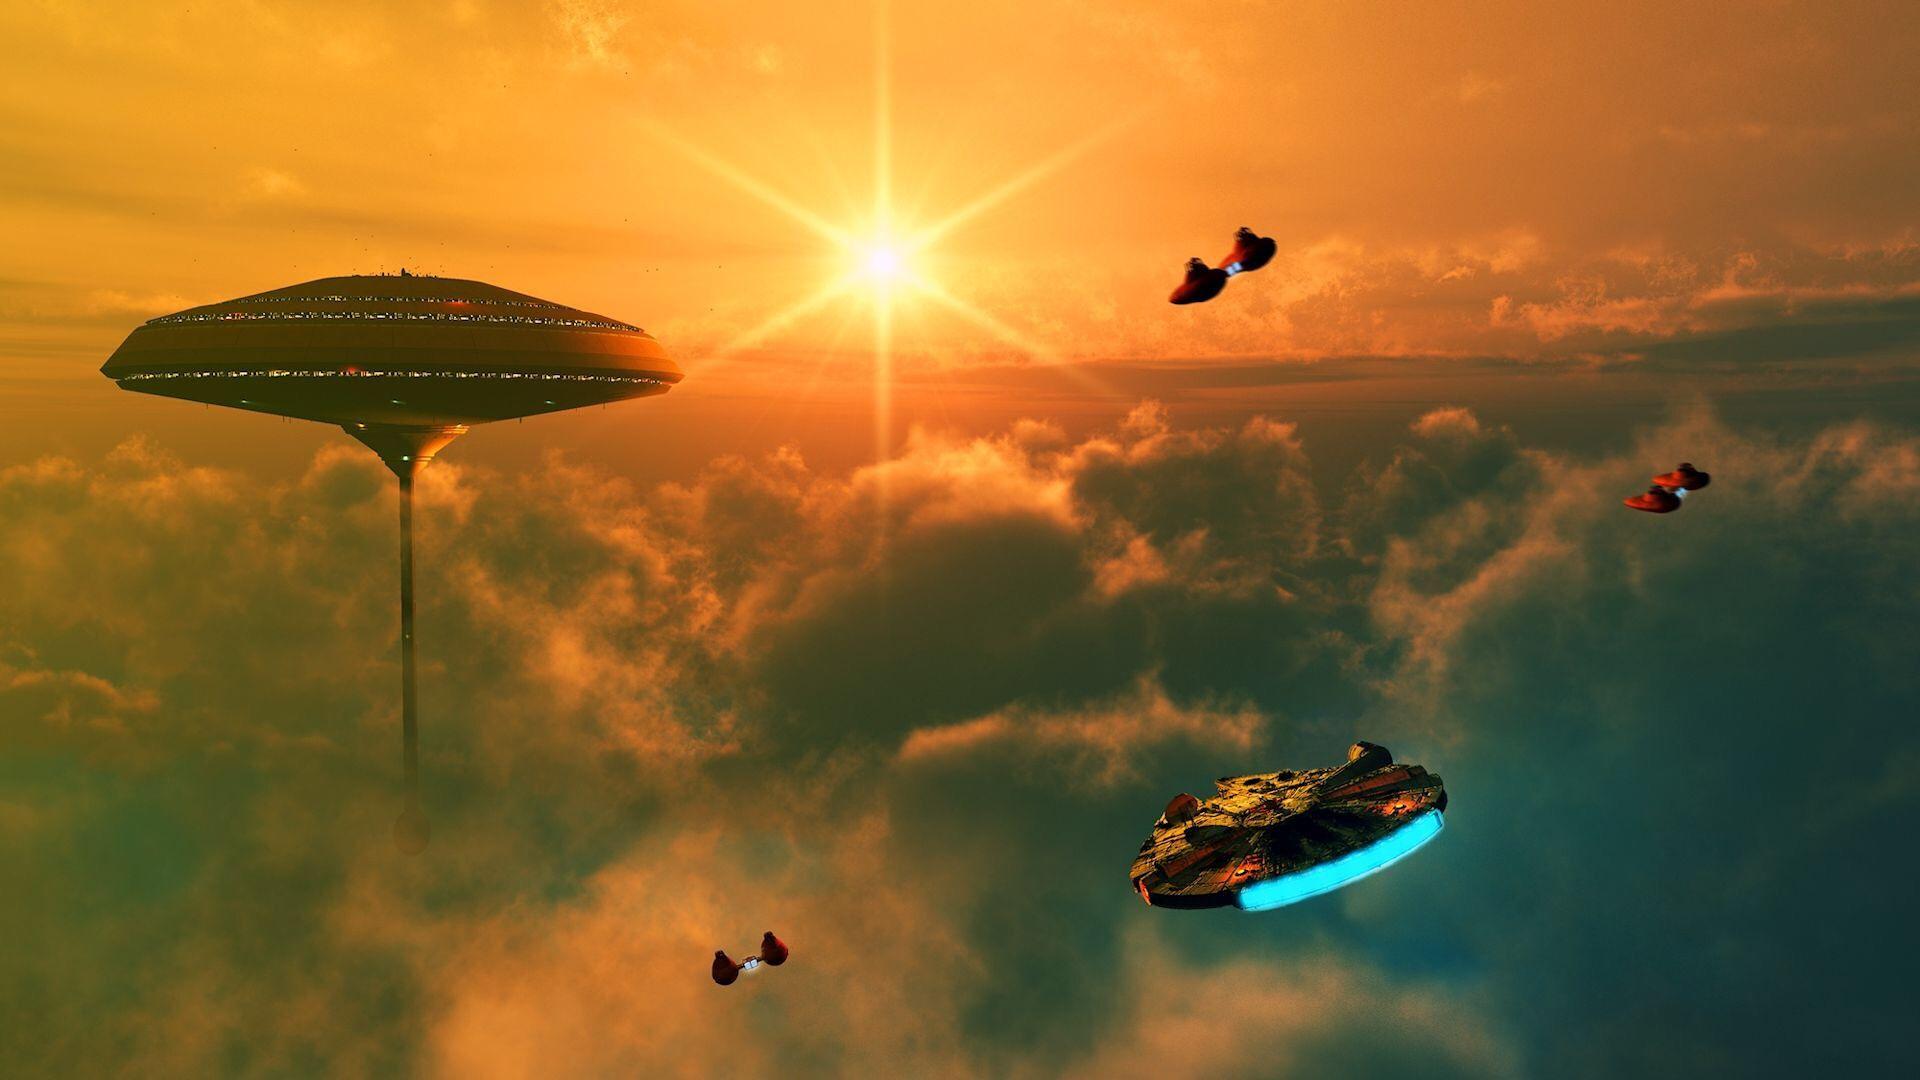 star-wars-battlefront-trailer-bespin-gamesoul01